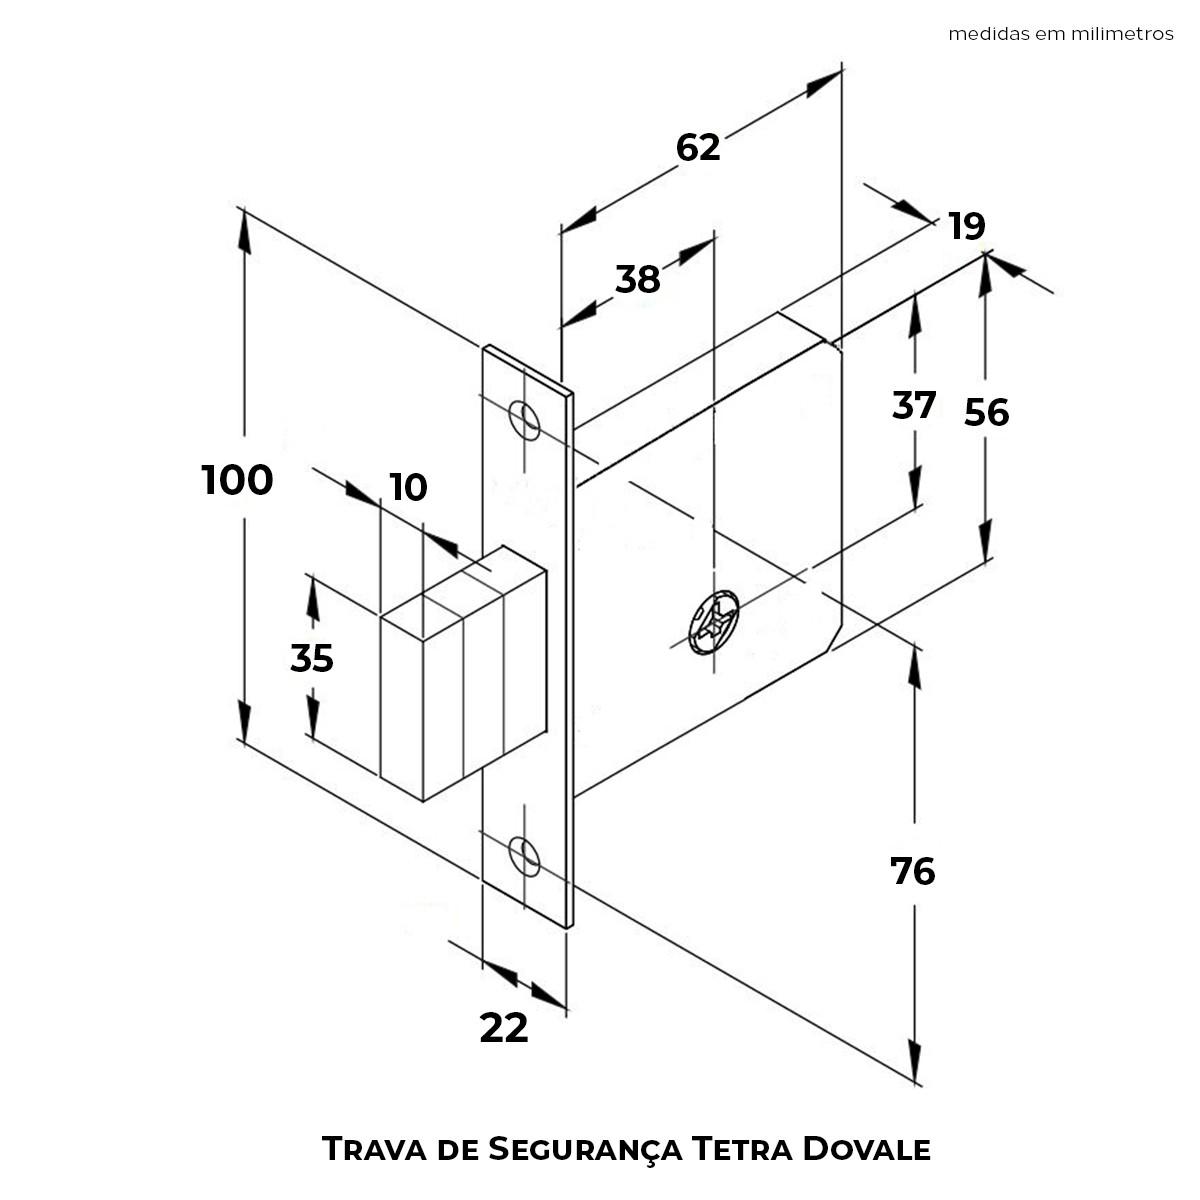 Trava de Segurança Dovale Tetra CR Cilindro e Chave Zamak Par - 78401